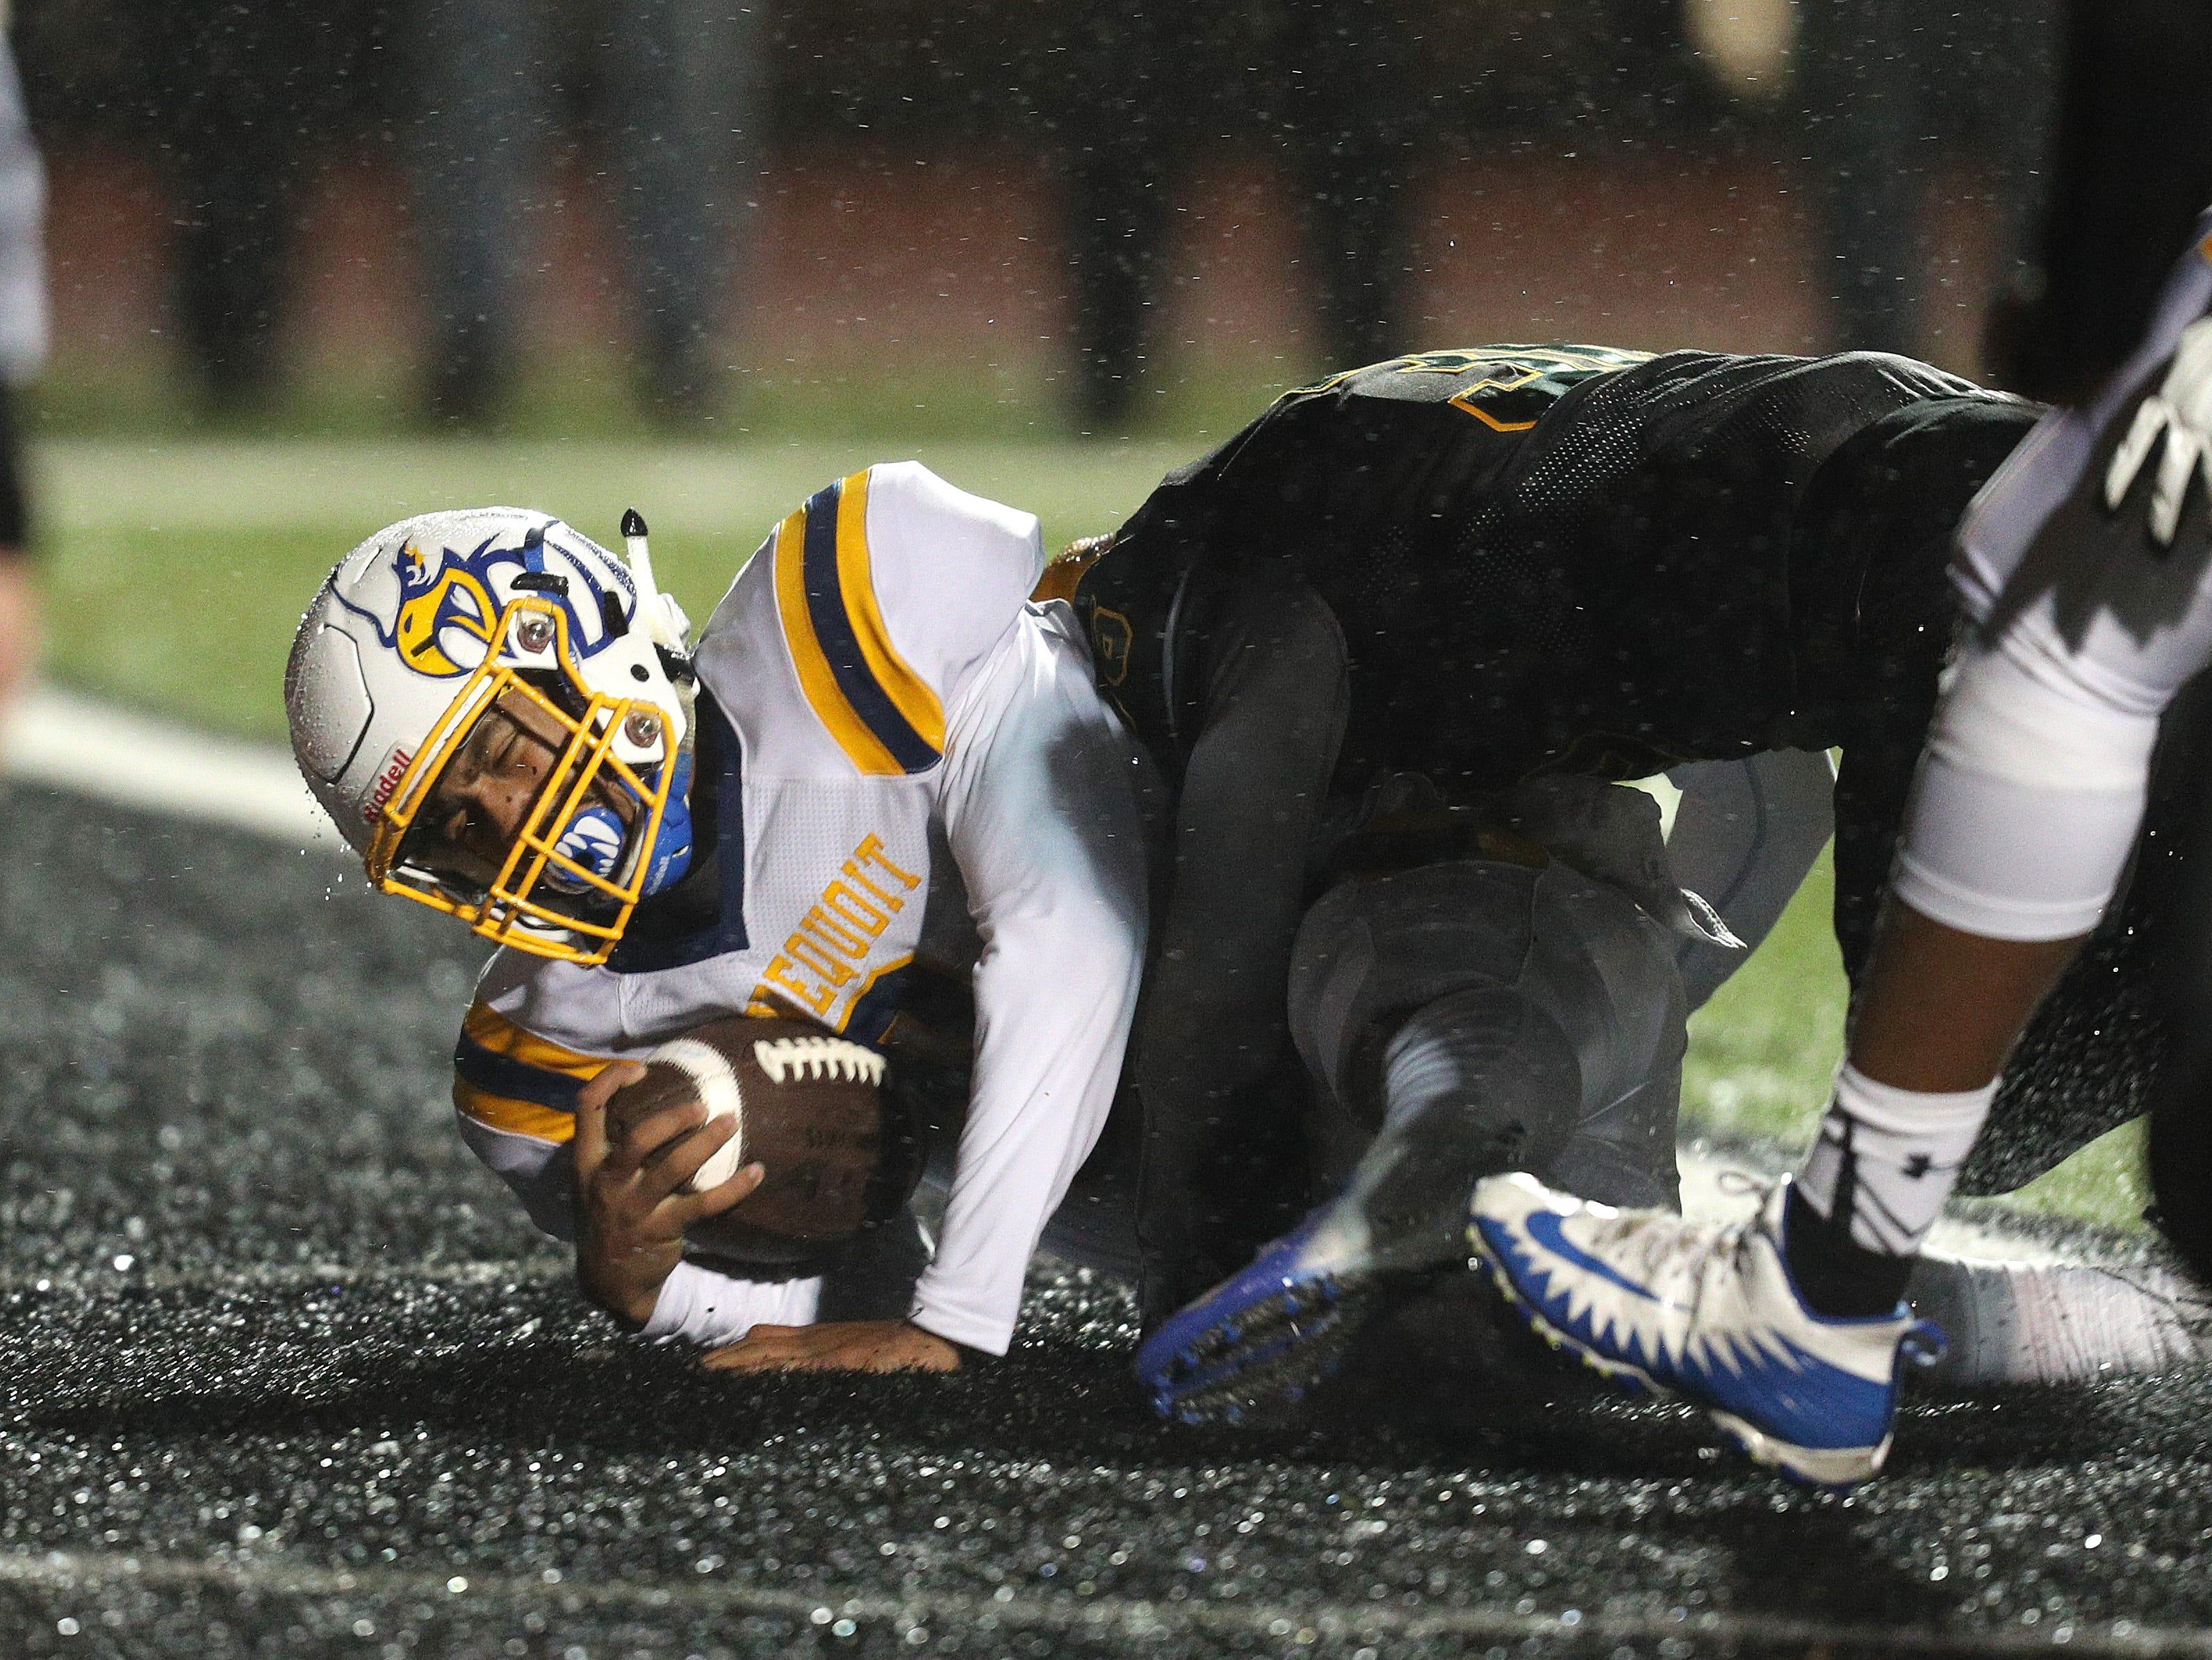 Freddy June Jr. scores a touchdown against West Seneca East in the Far West Regional  Class A game.